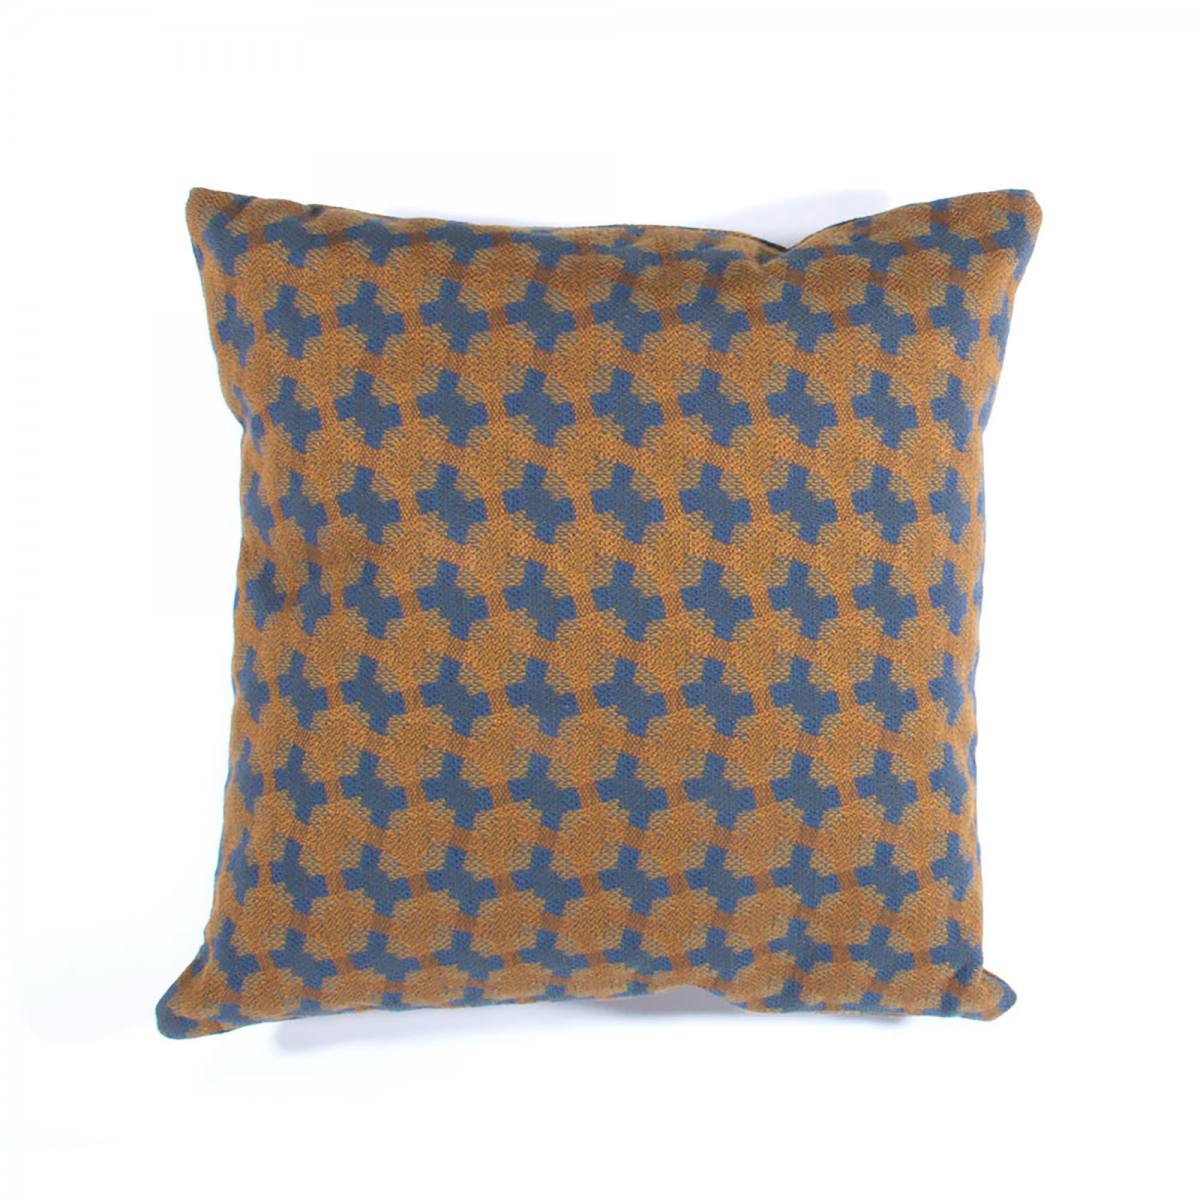 01-20140503-pillow-01